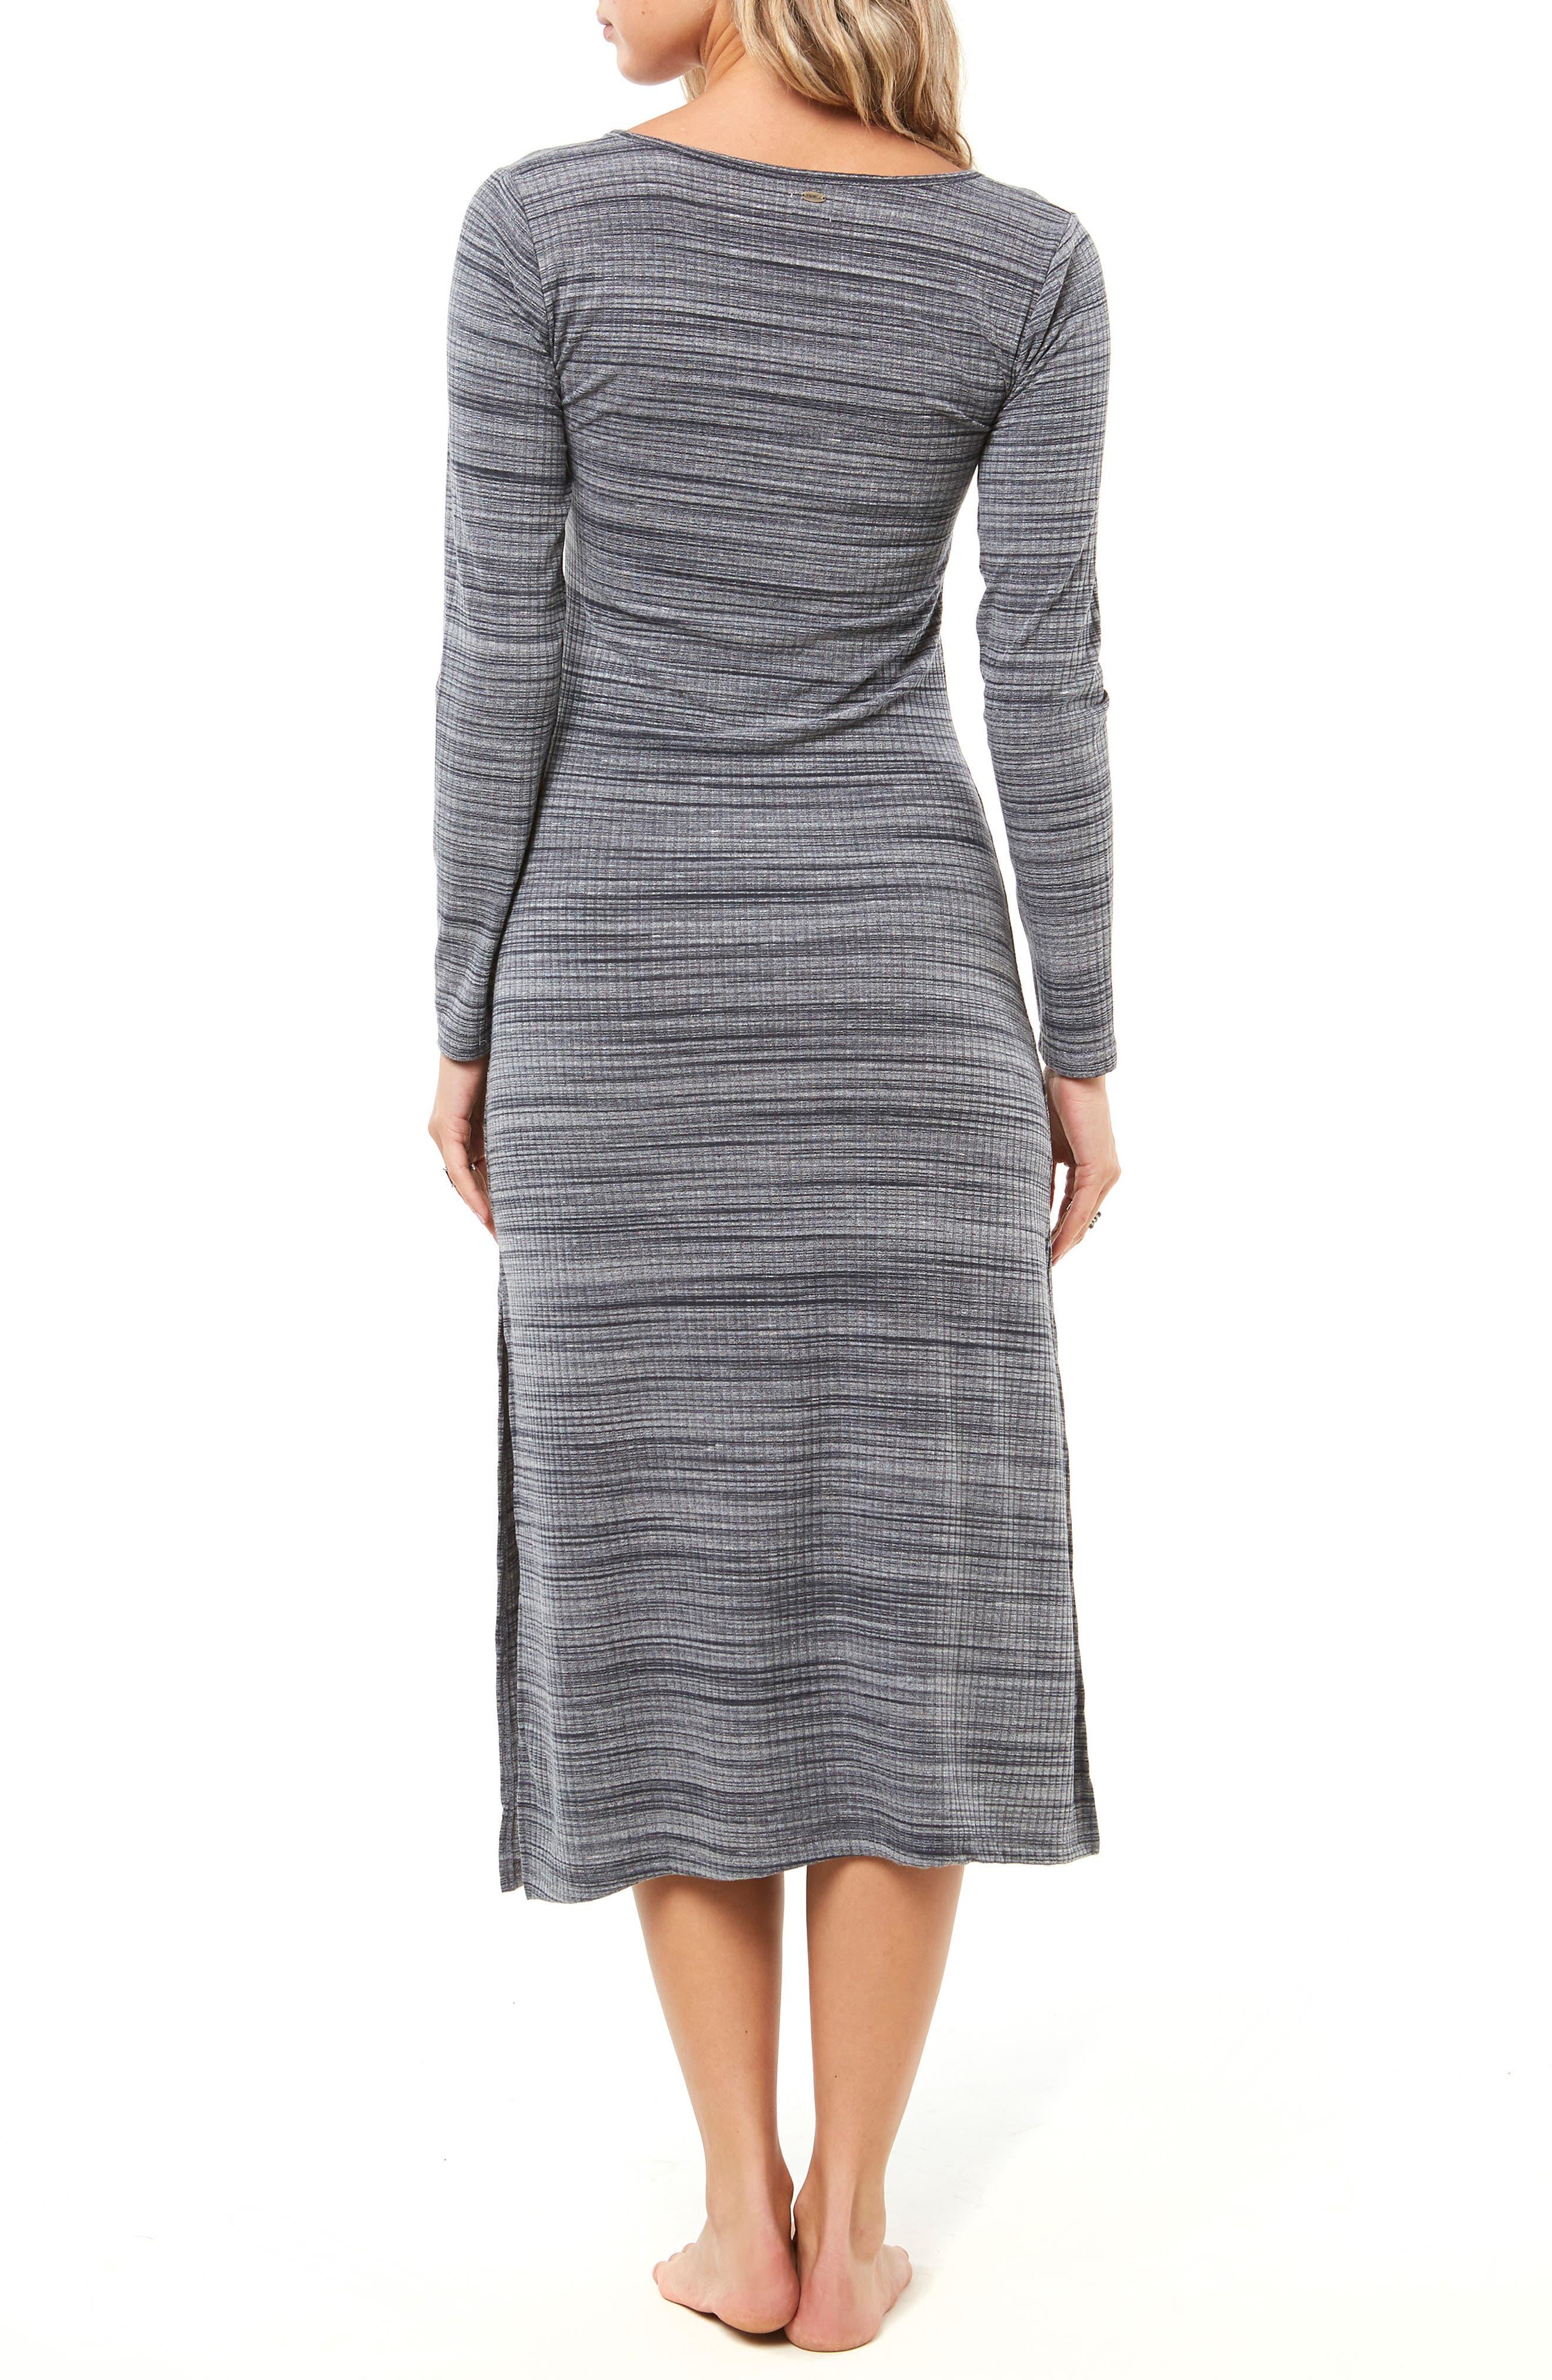 Shellsea Knit Midi Dress,                             Alternate thumbnail 2, color,                             INDIAN TEAL